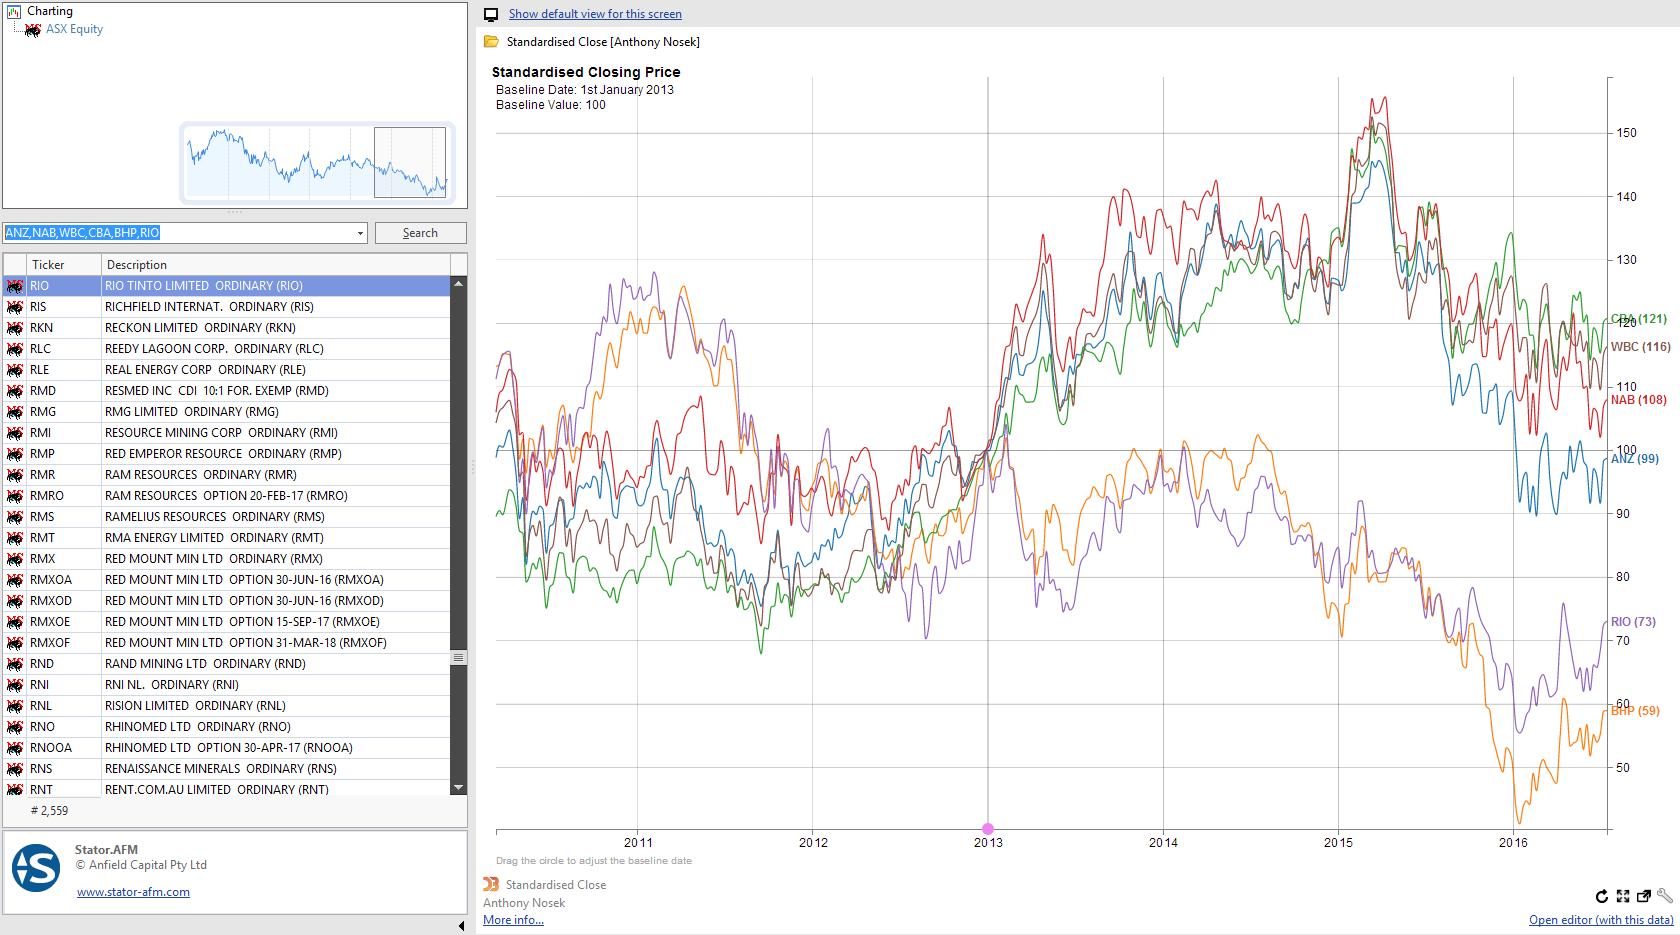 stator-visual-studies/markets-charting at master · anthonynosek